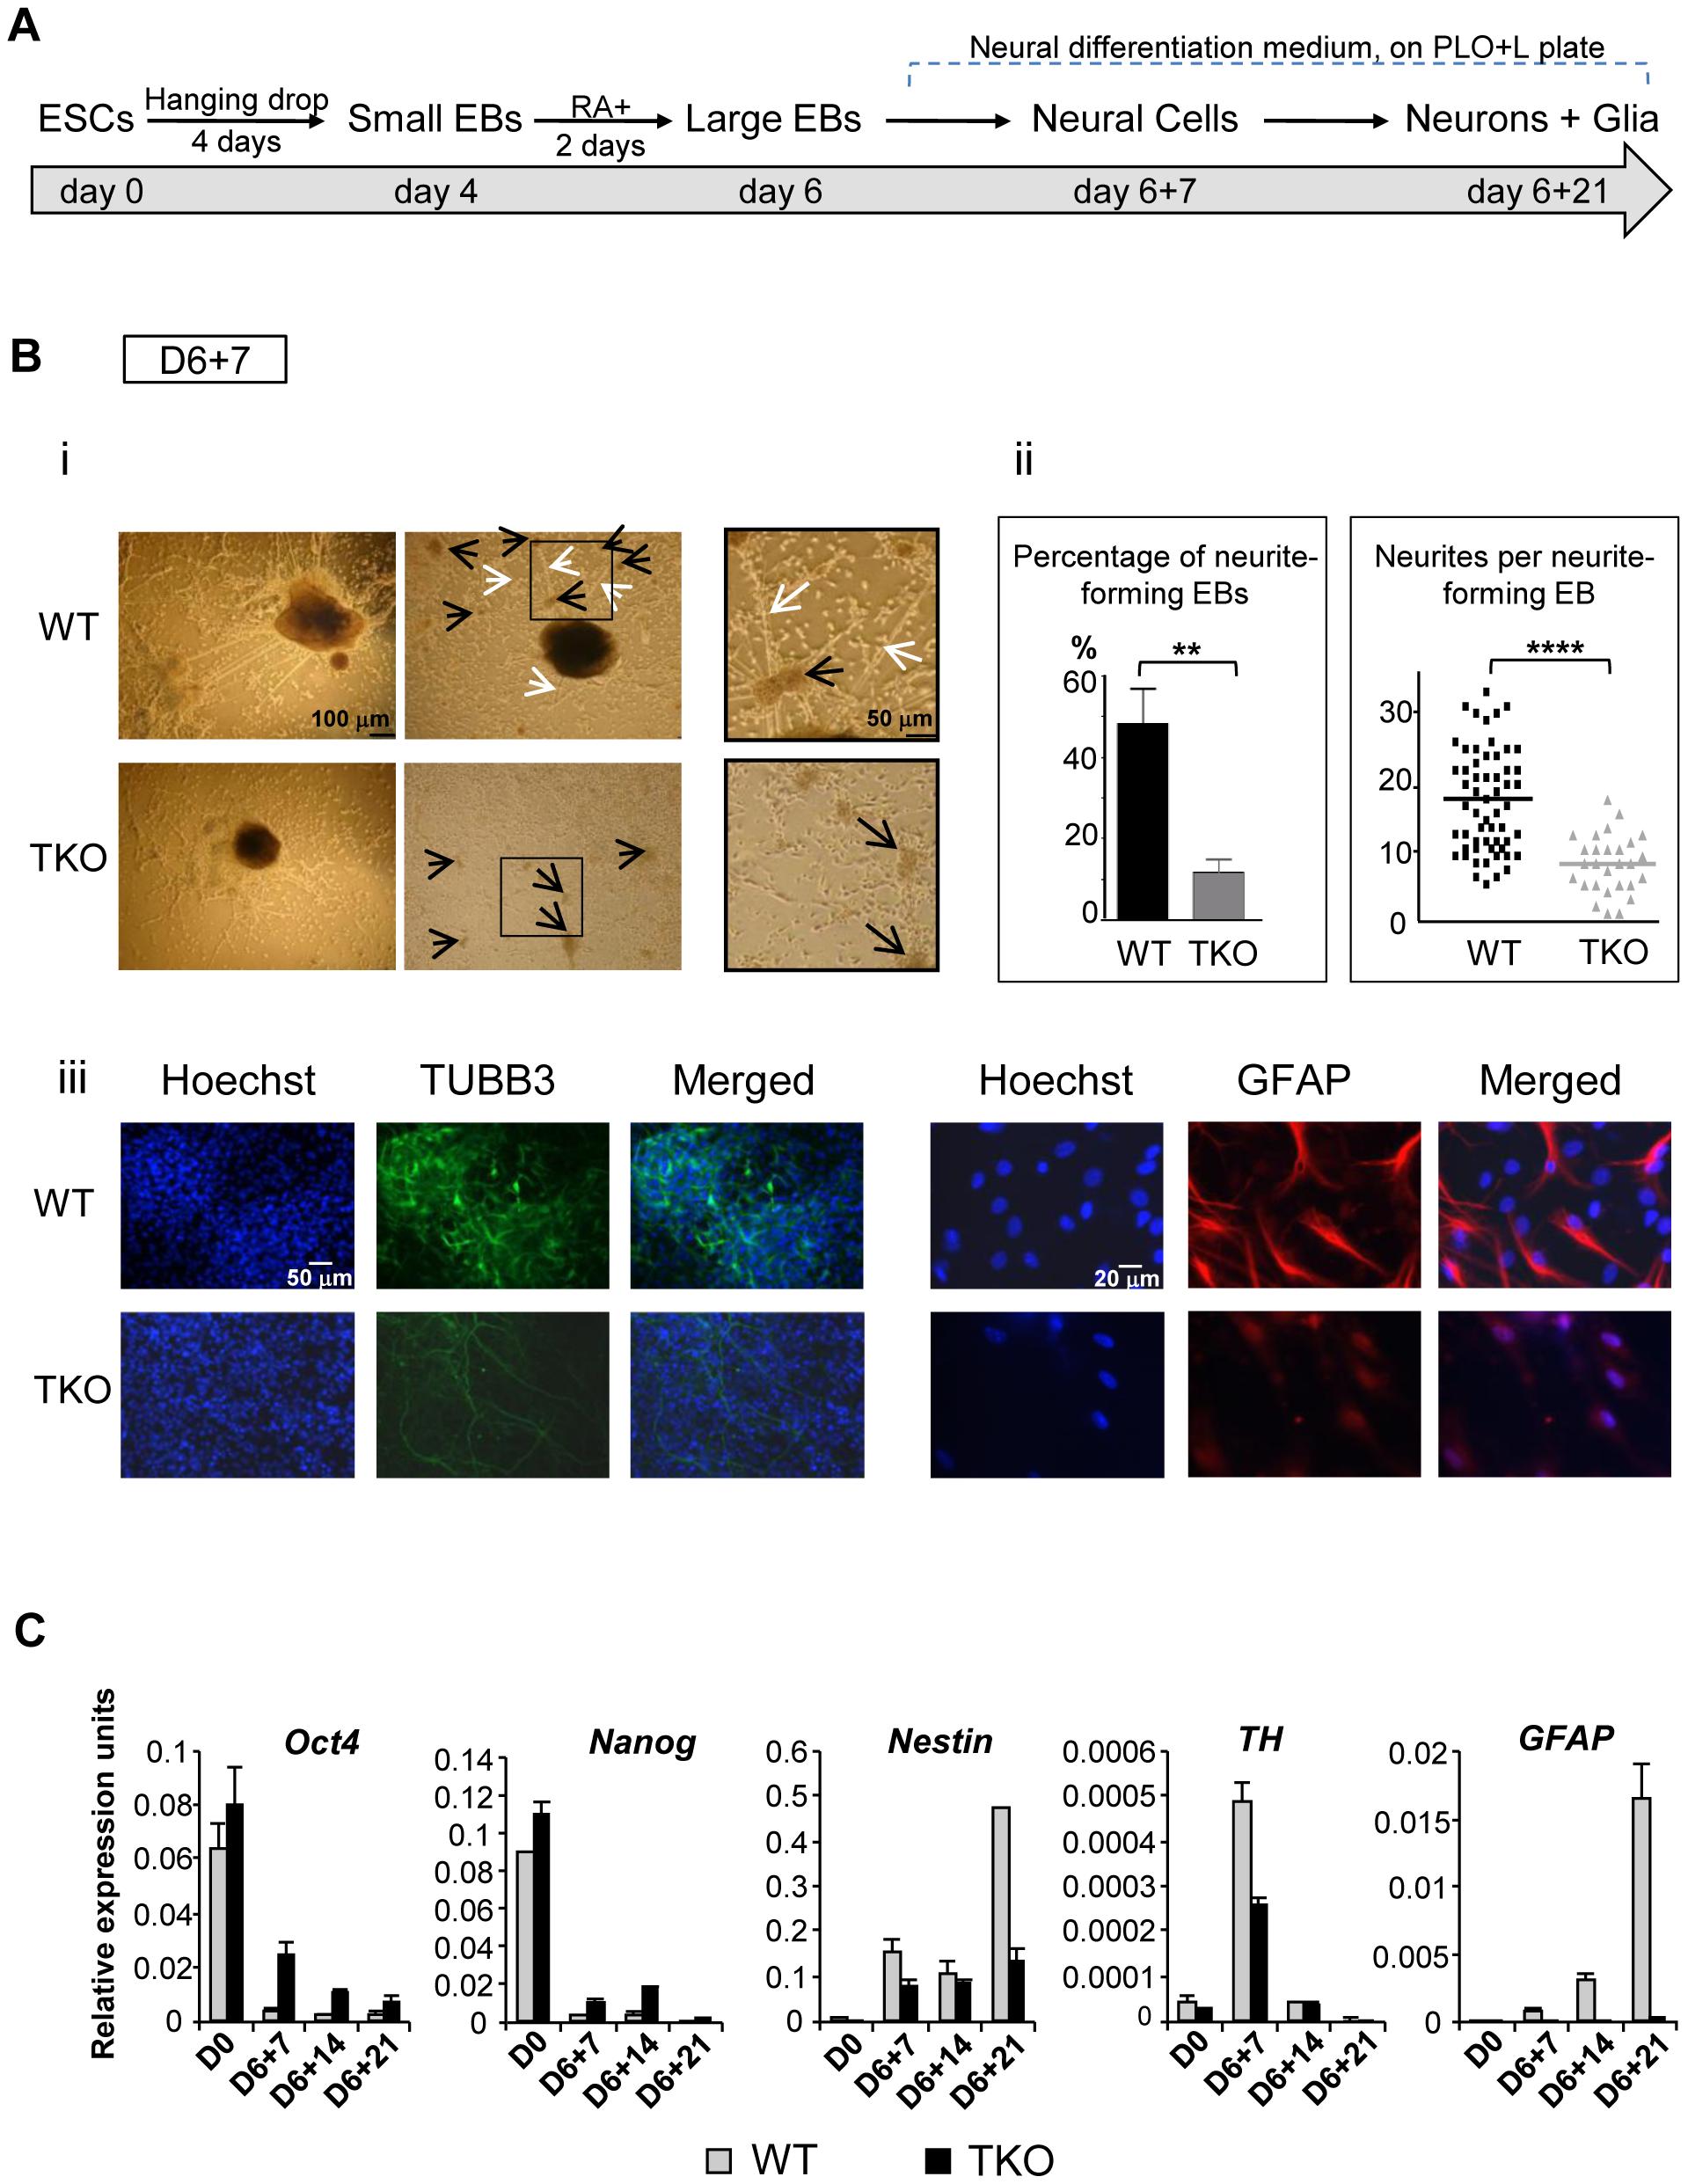 H1 TKO ESCs fail to undergo neural differentiation.